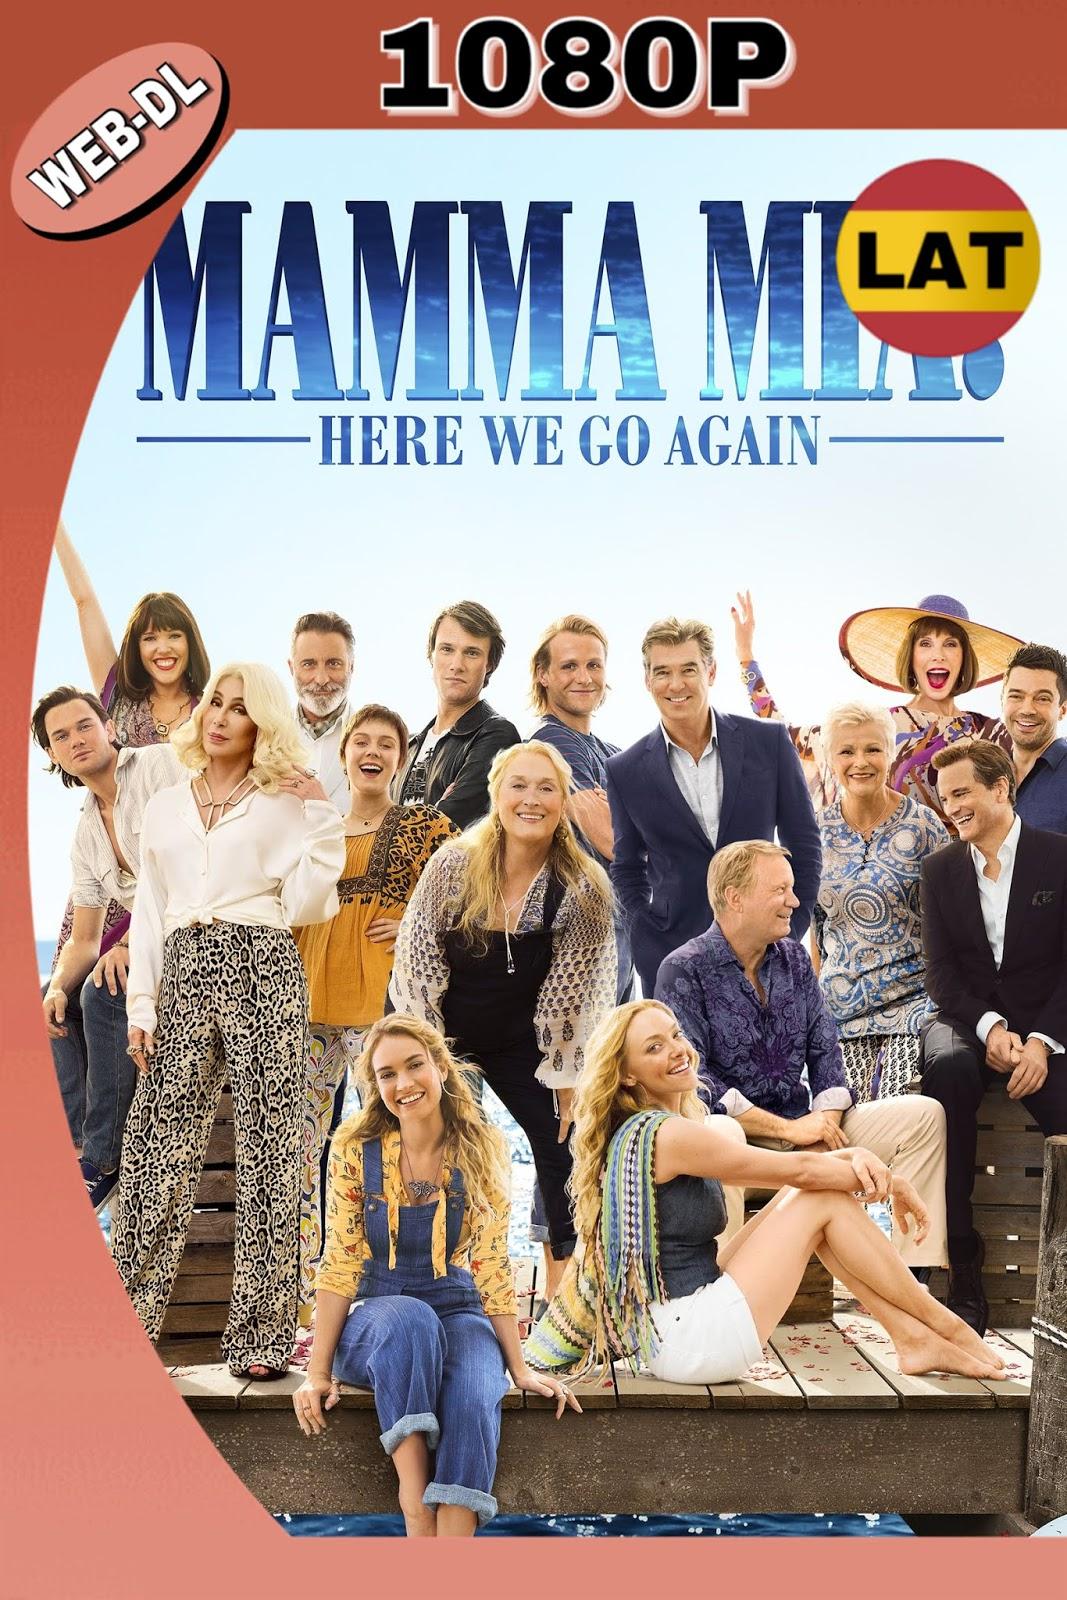 MAMMA MIA: UNA Y OTRA VEZ 2018 LAT-ING HD WEBDL 1080P 4GB.mkv